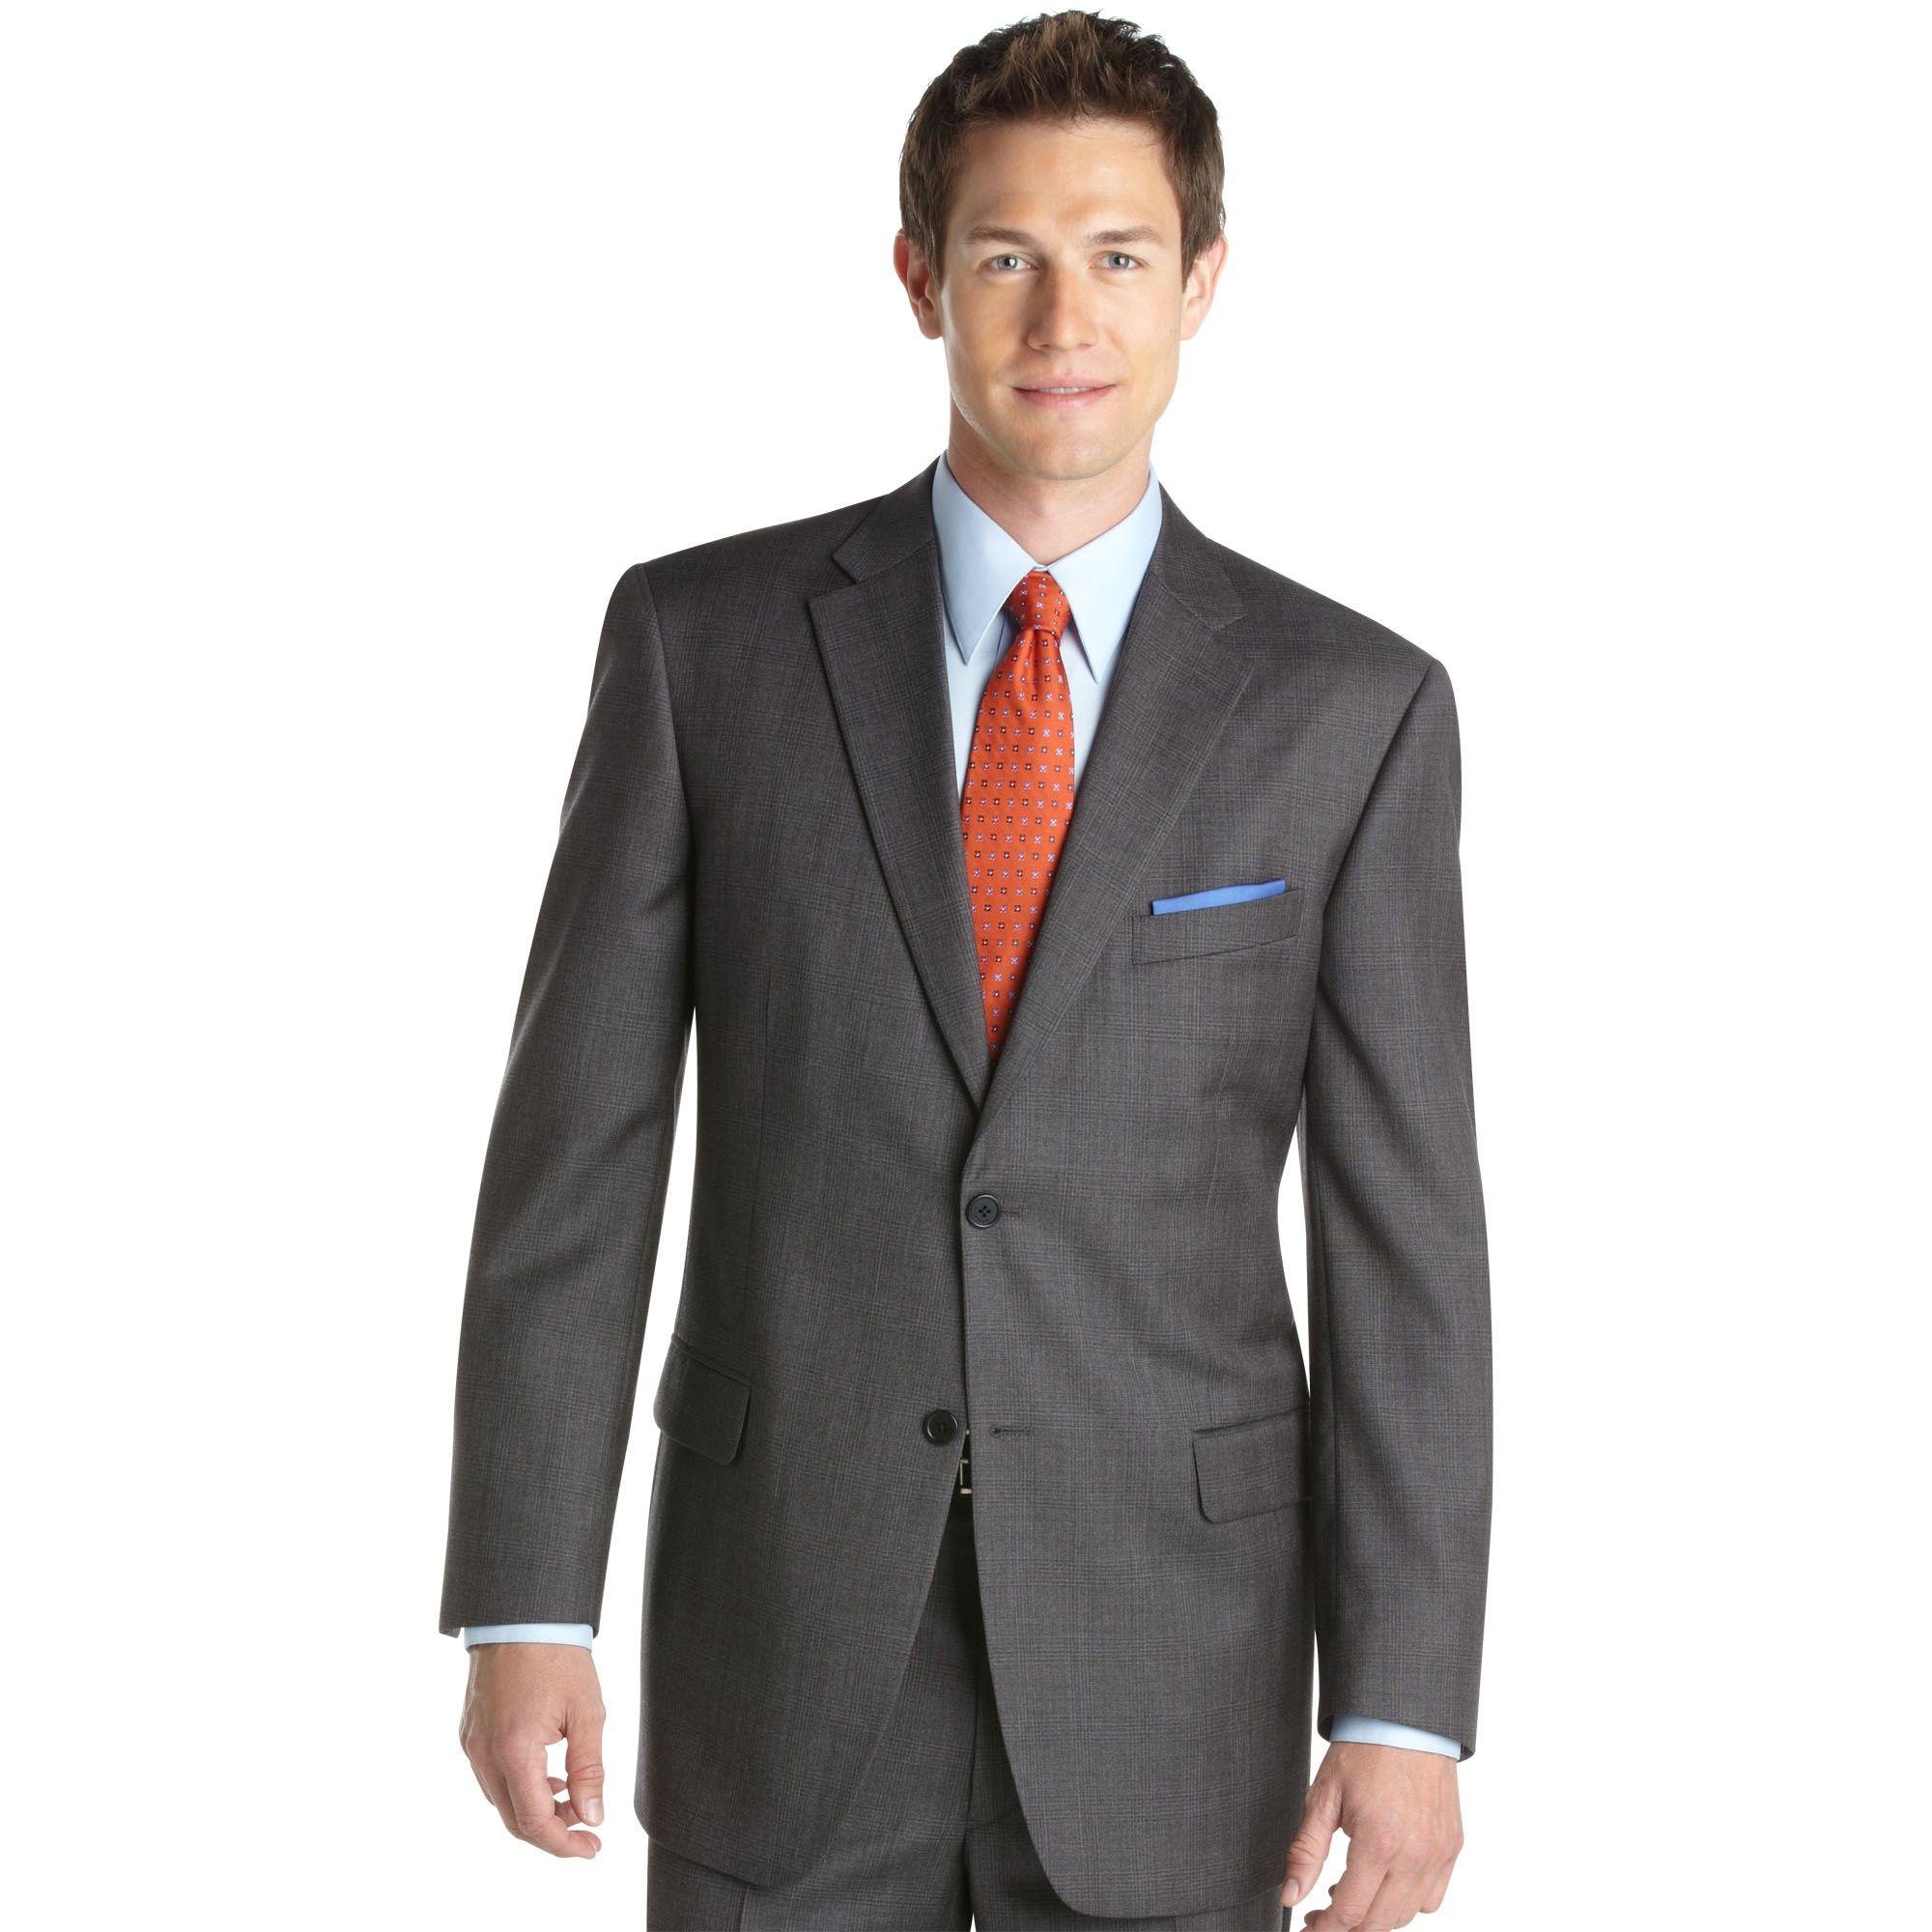 Colorful Suit Color For Wedding Sketch - Wedding Dress Ideas ...